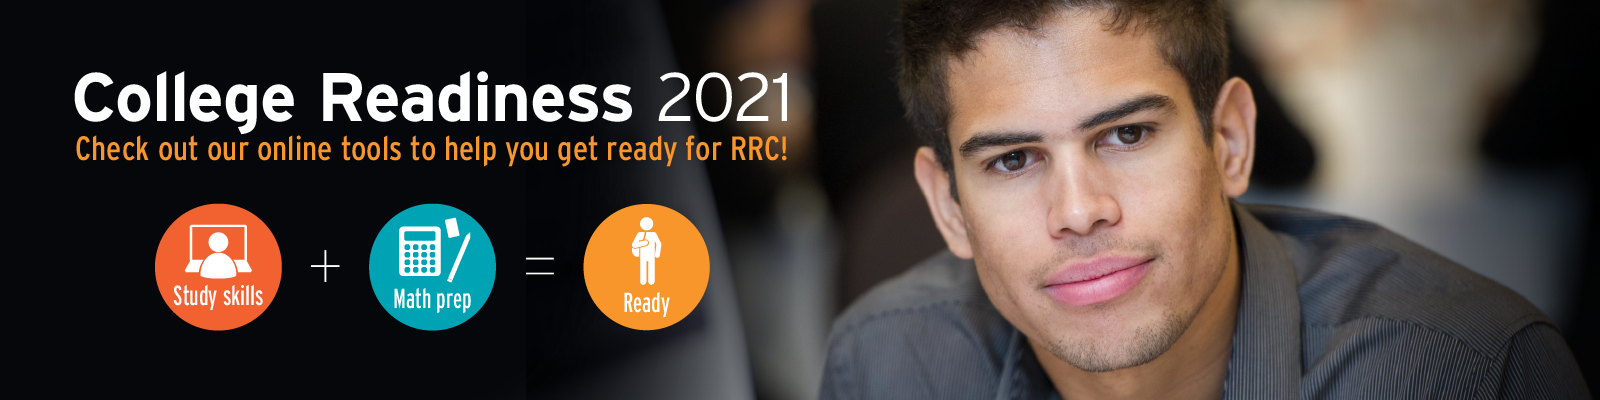 College readiness image header